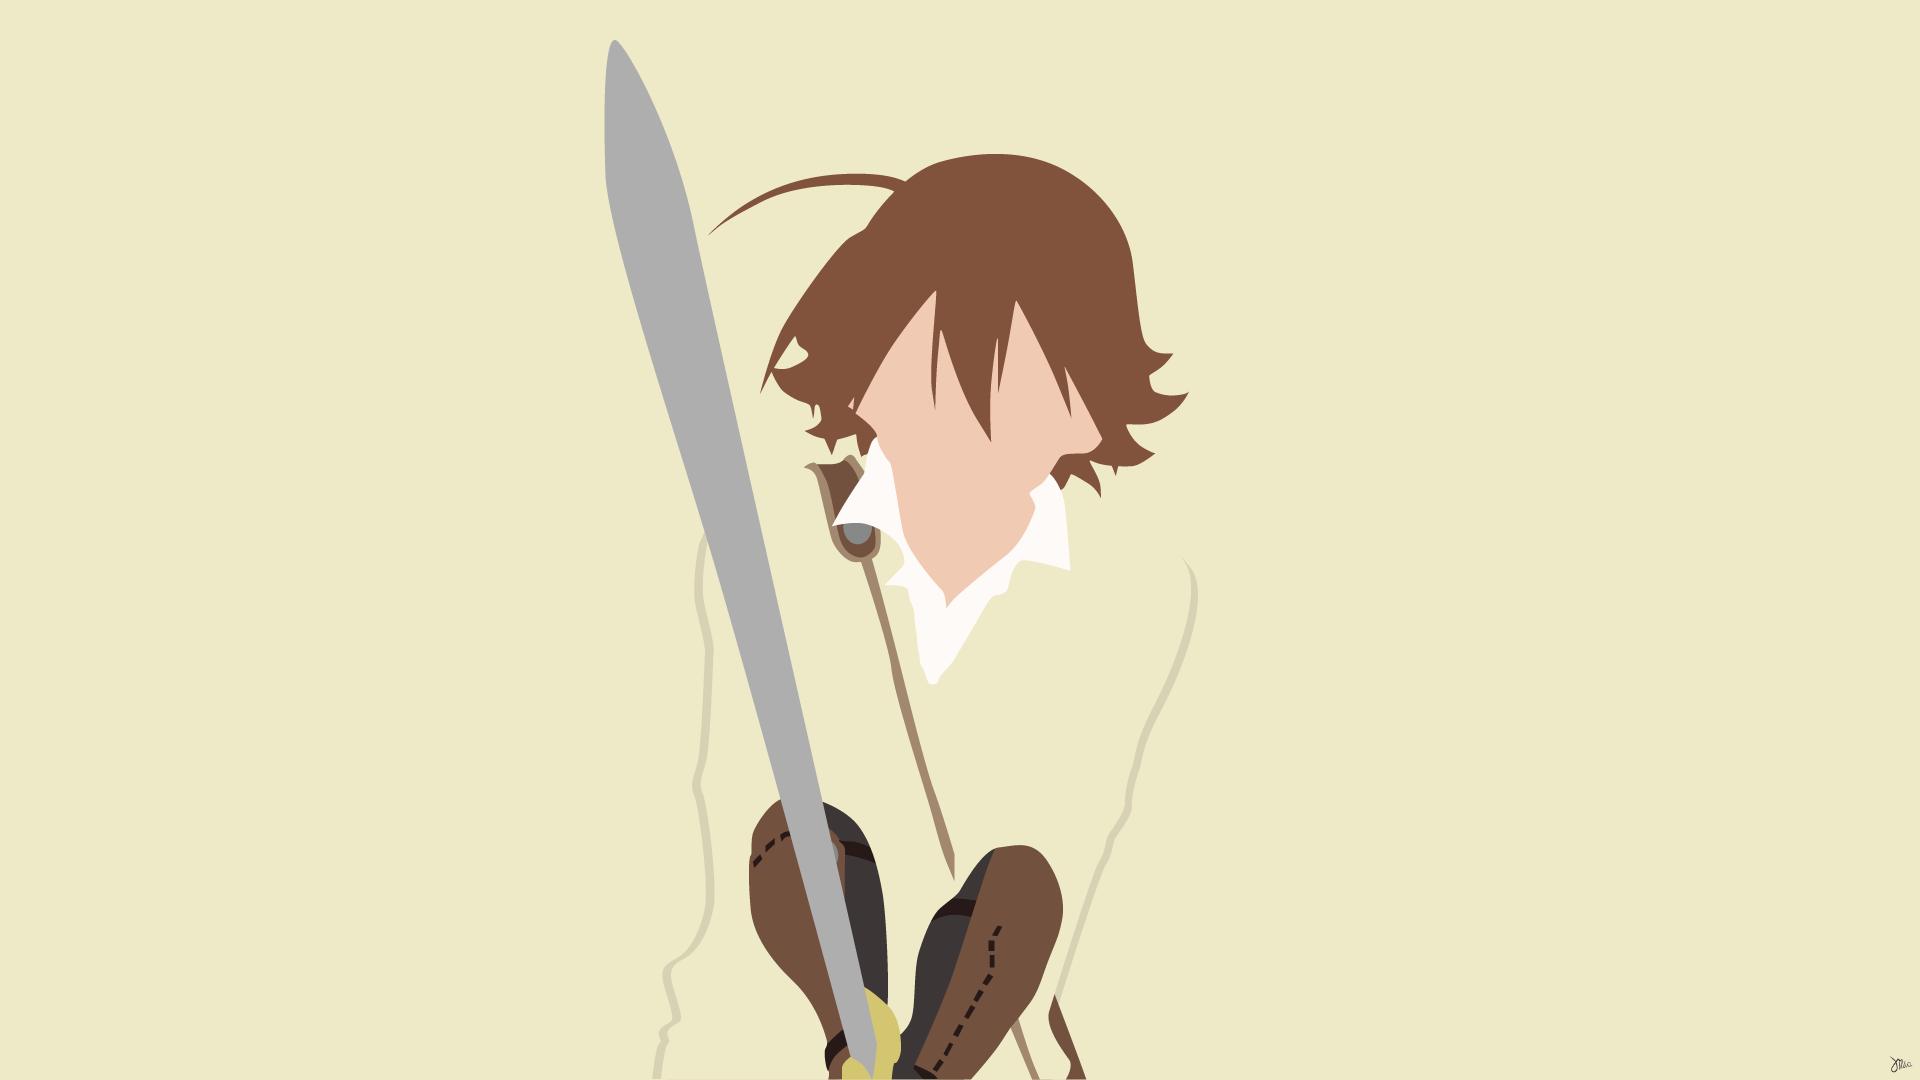 Wallpaper Illustration Anime Boys Cartoon Sword Akame Ga